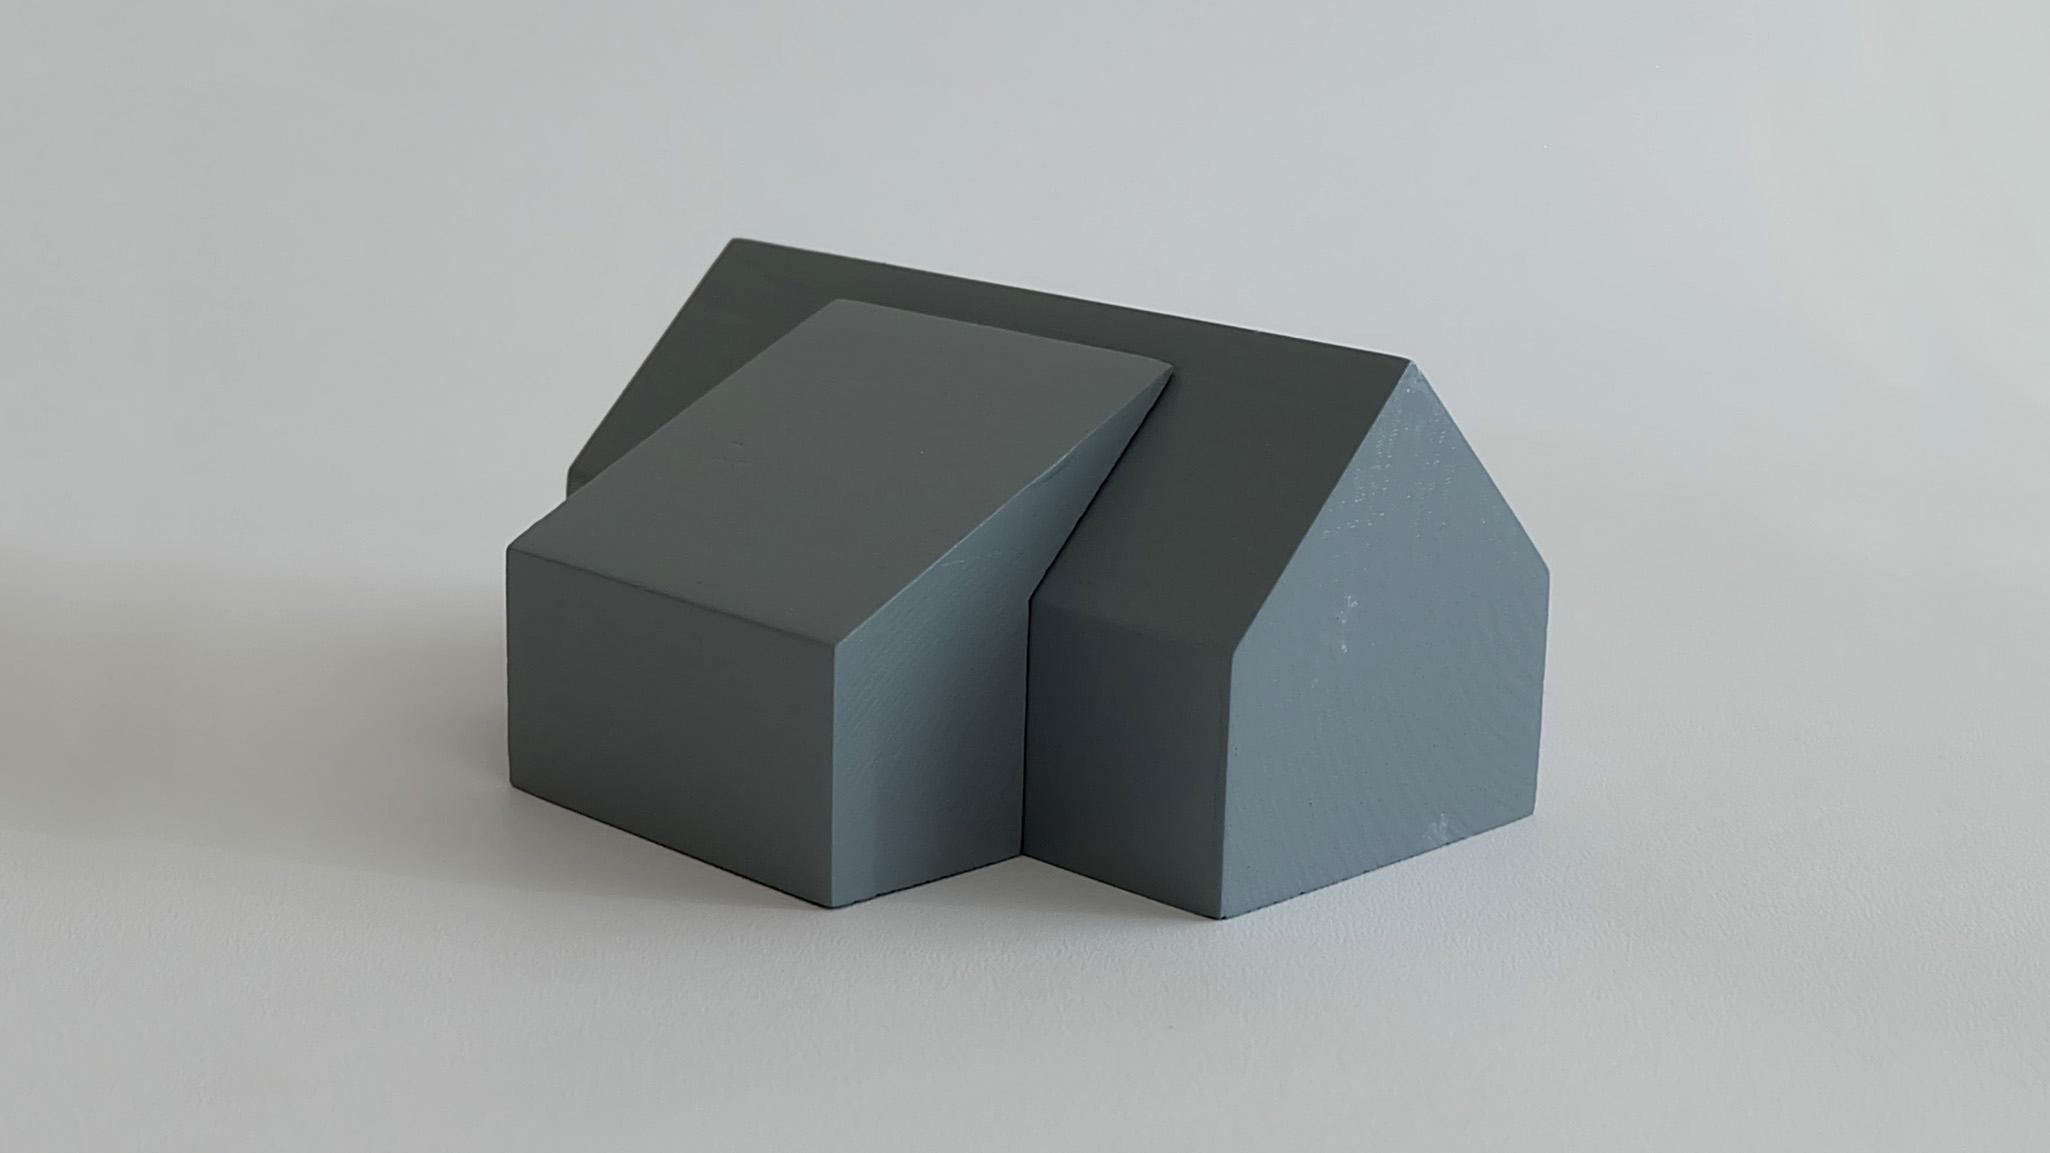 L11:  L09 + mono-pitch roof porch